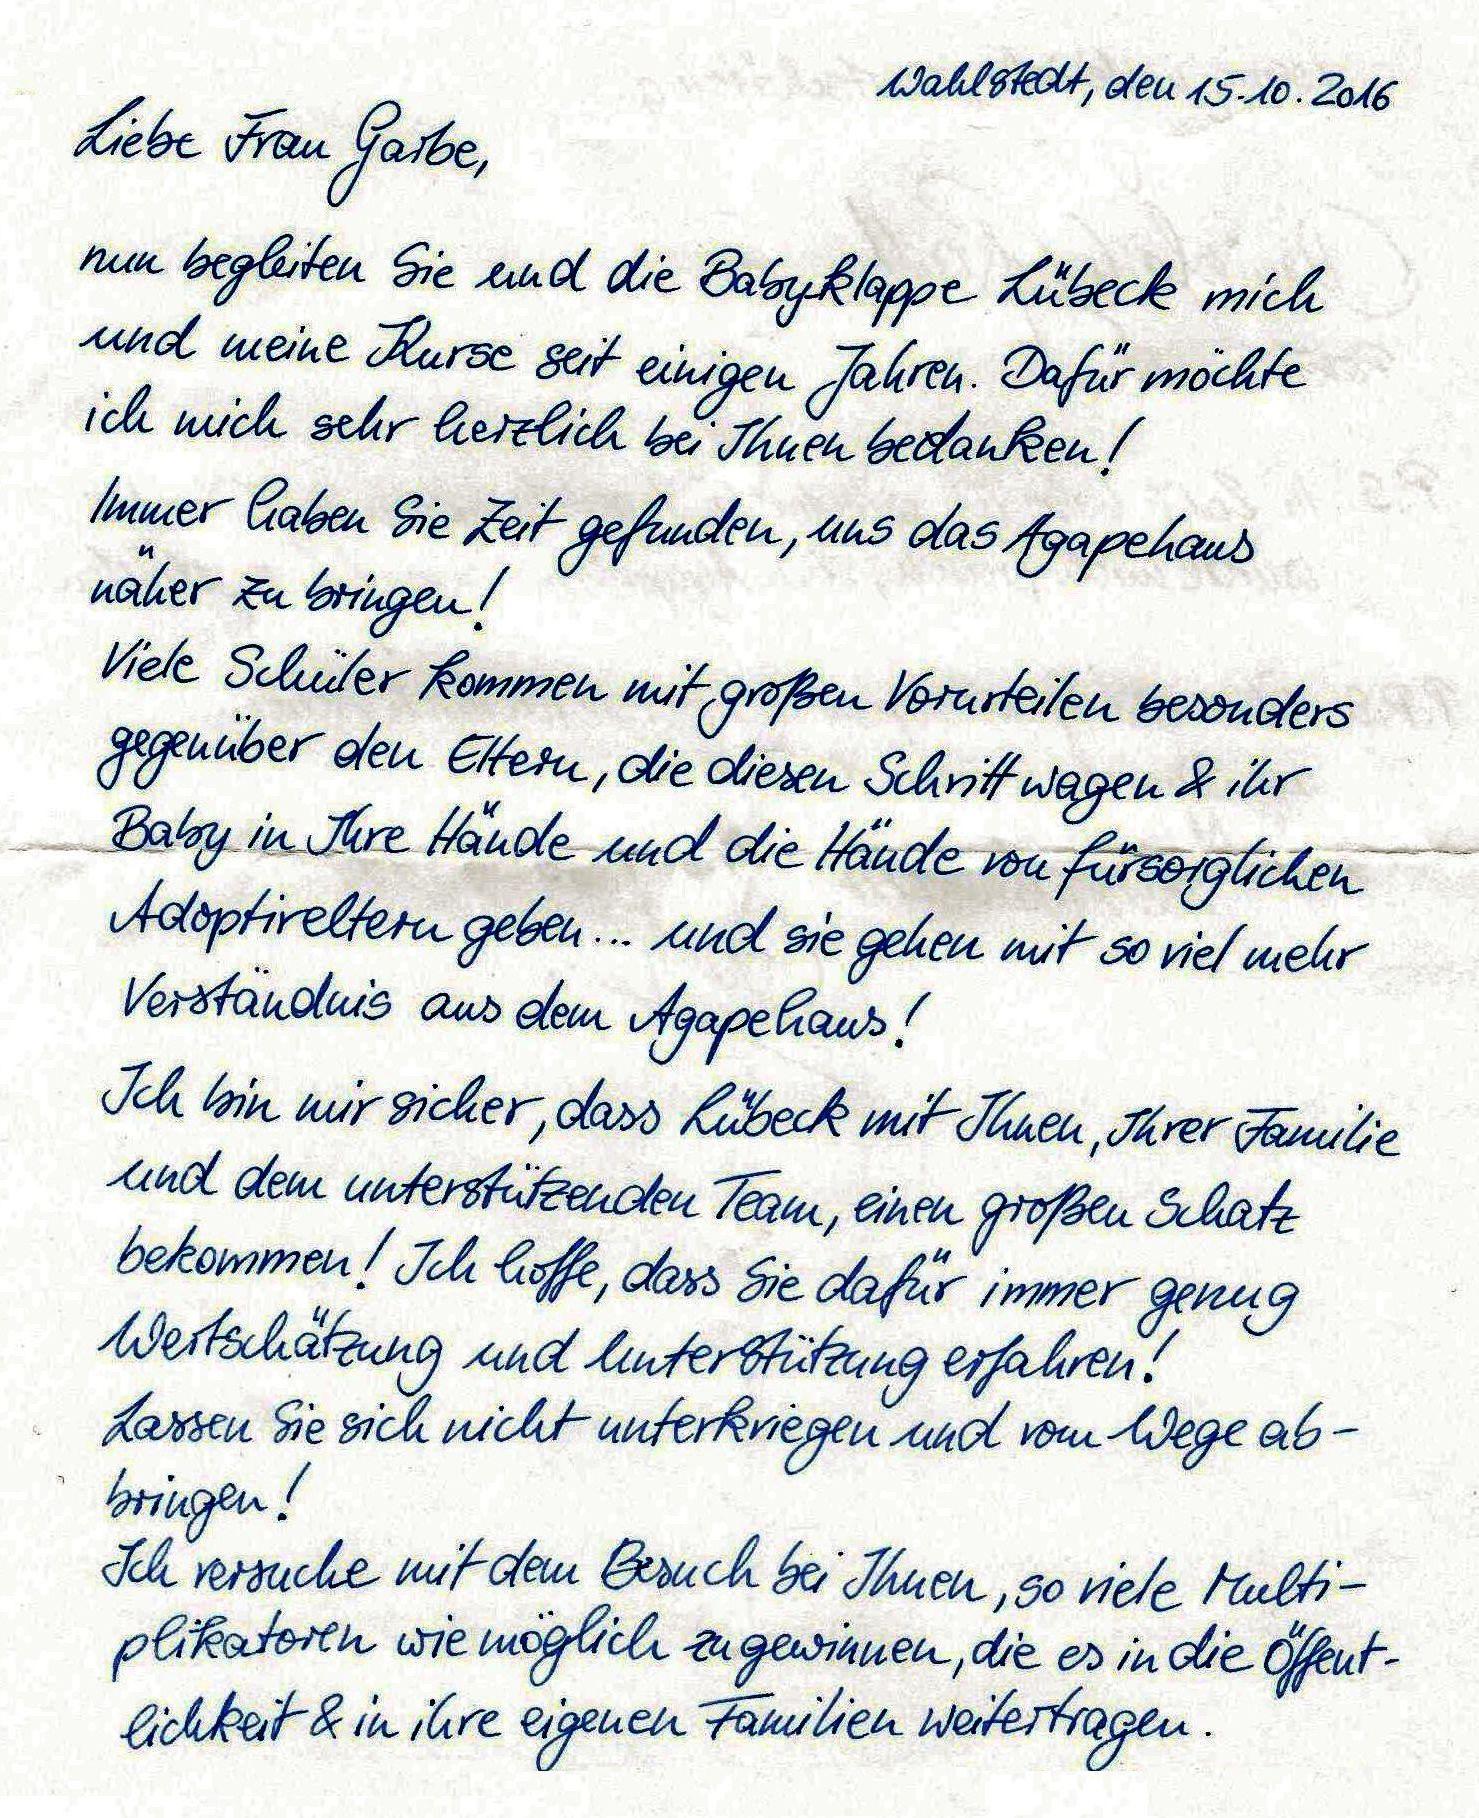 Startseite | Agape Haus - Leben bewahren Lübeck e.V.